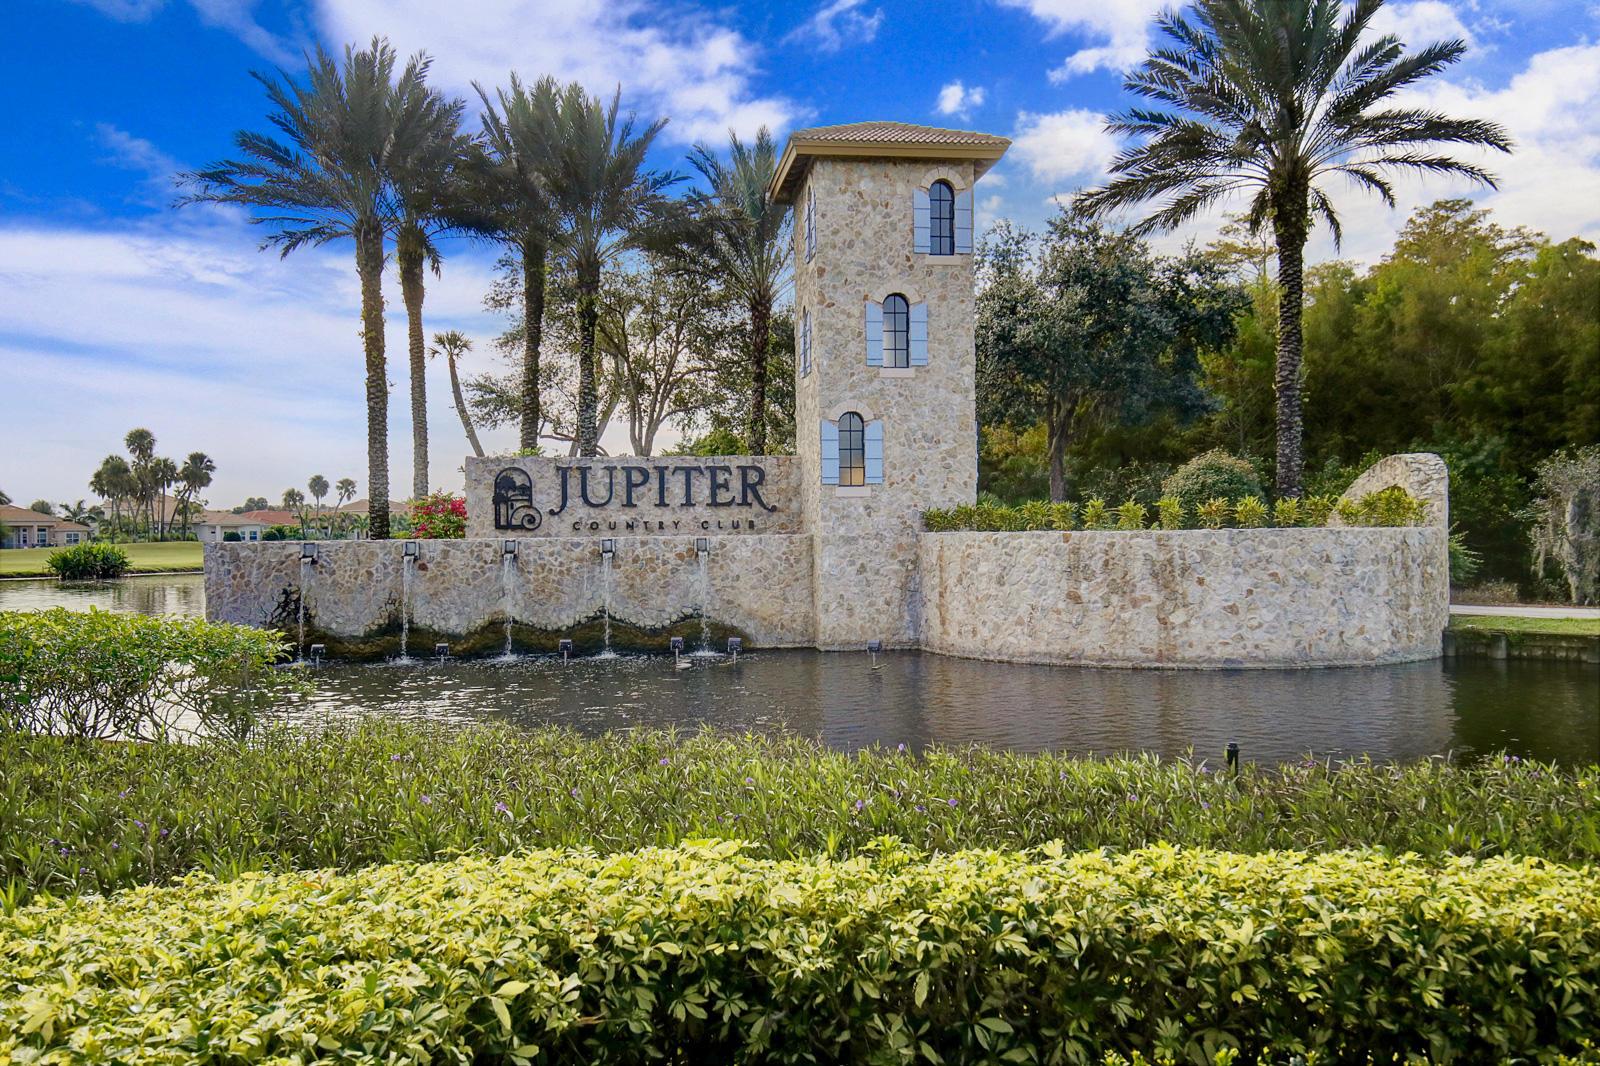 JUPITER COUNTRY CLUB JUPITER FLORIDA